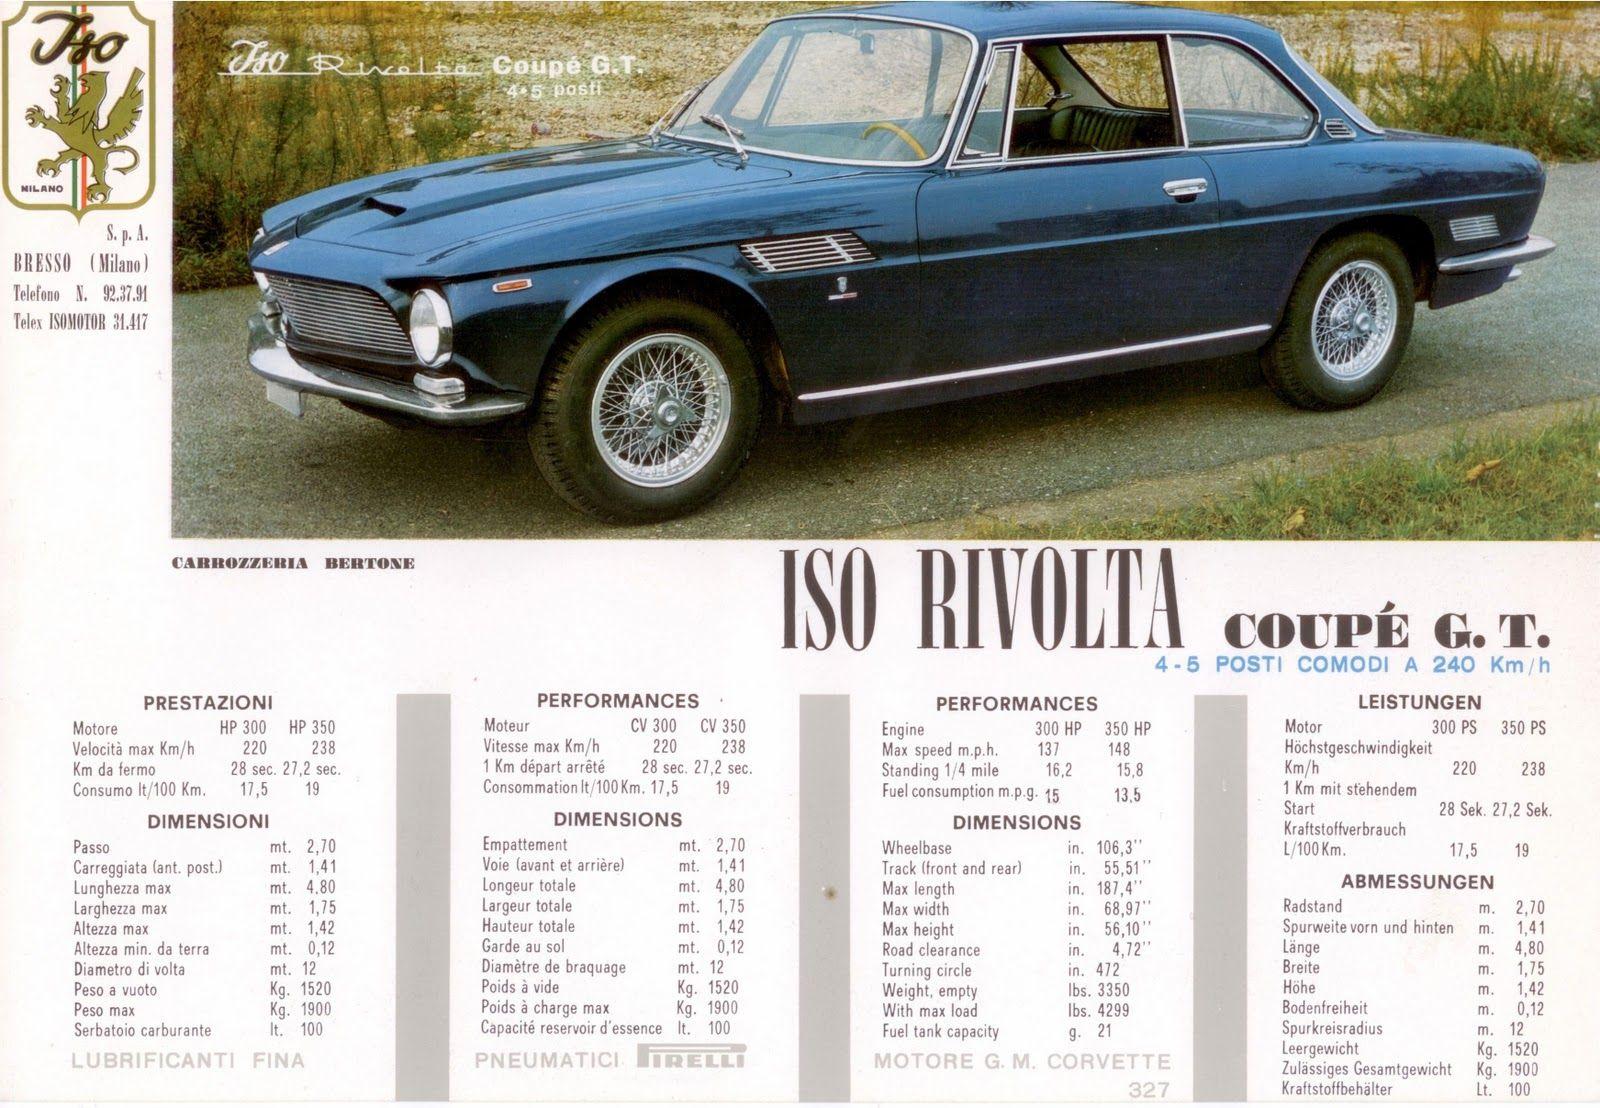 Iso Rivolta Coupe GT   Automobile Ads & Artwork   Pinterest   Cars